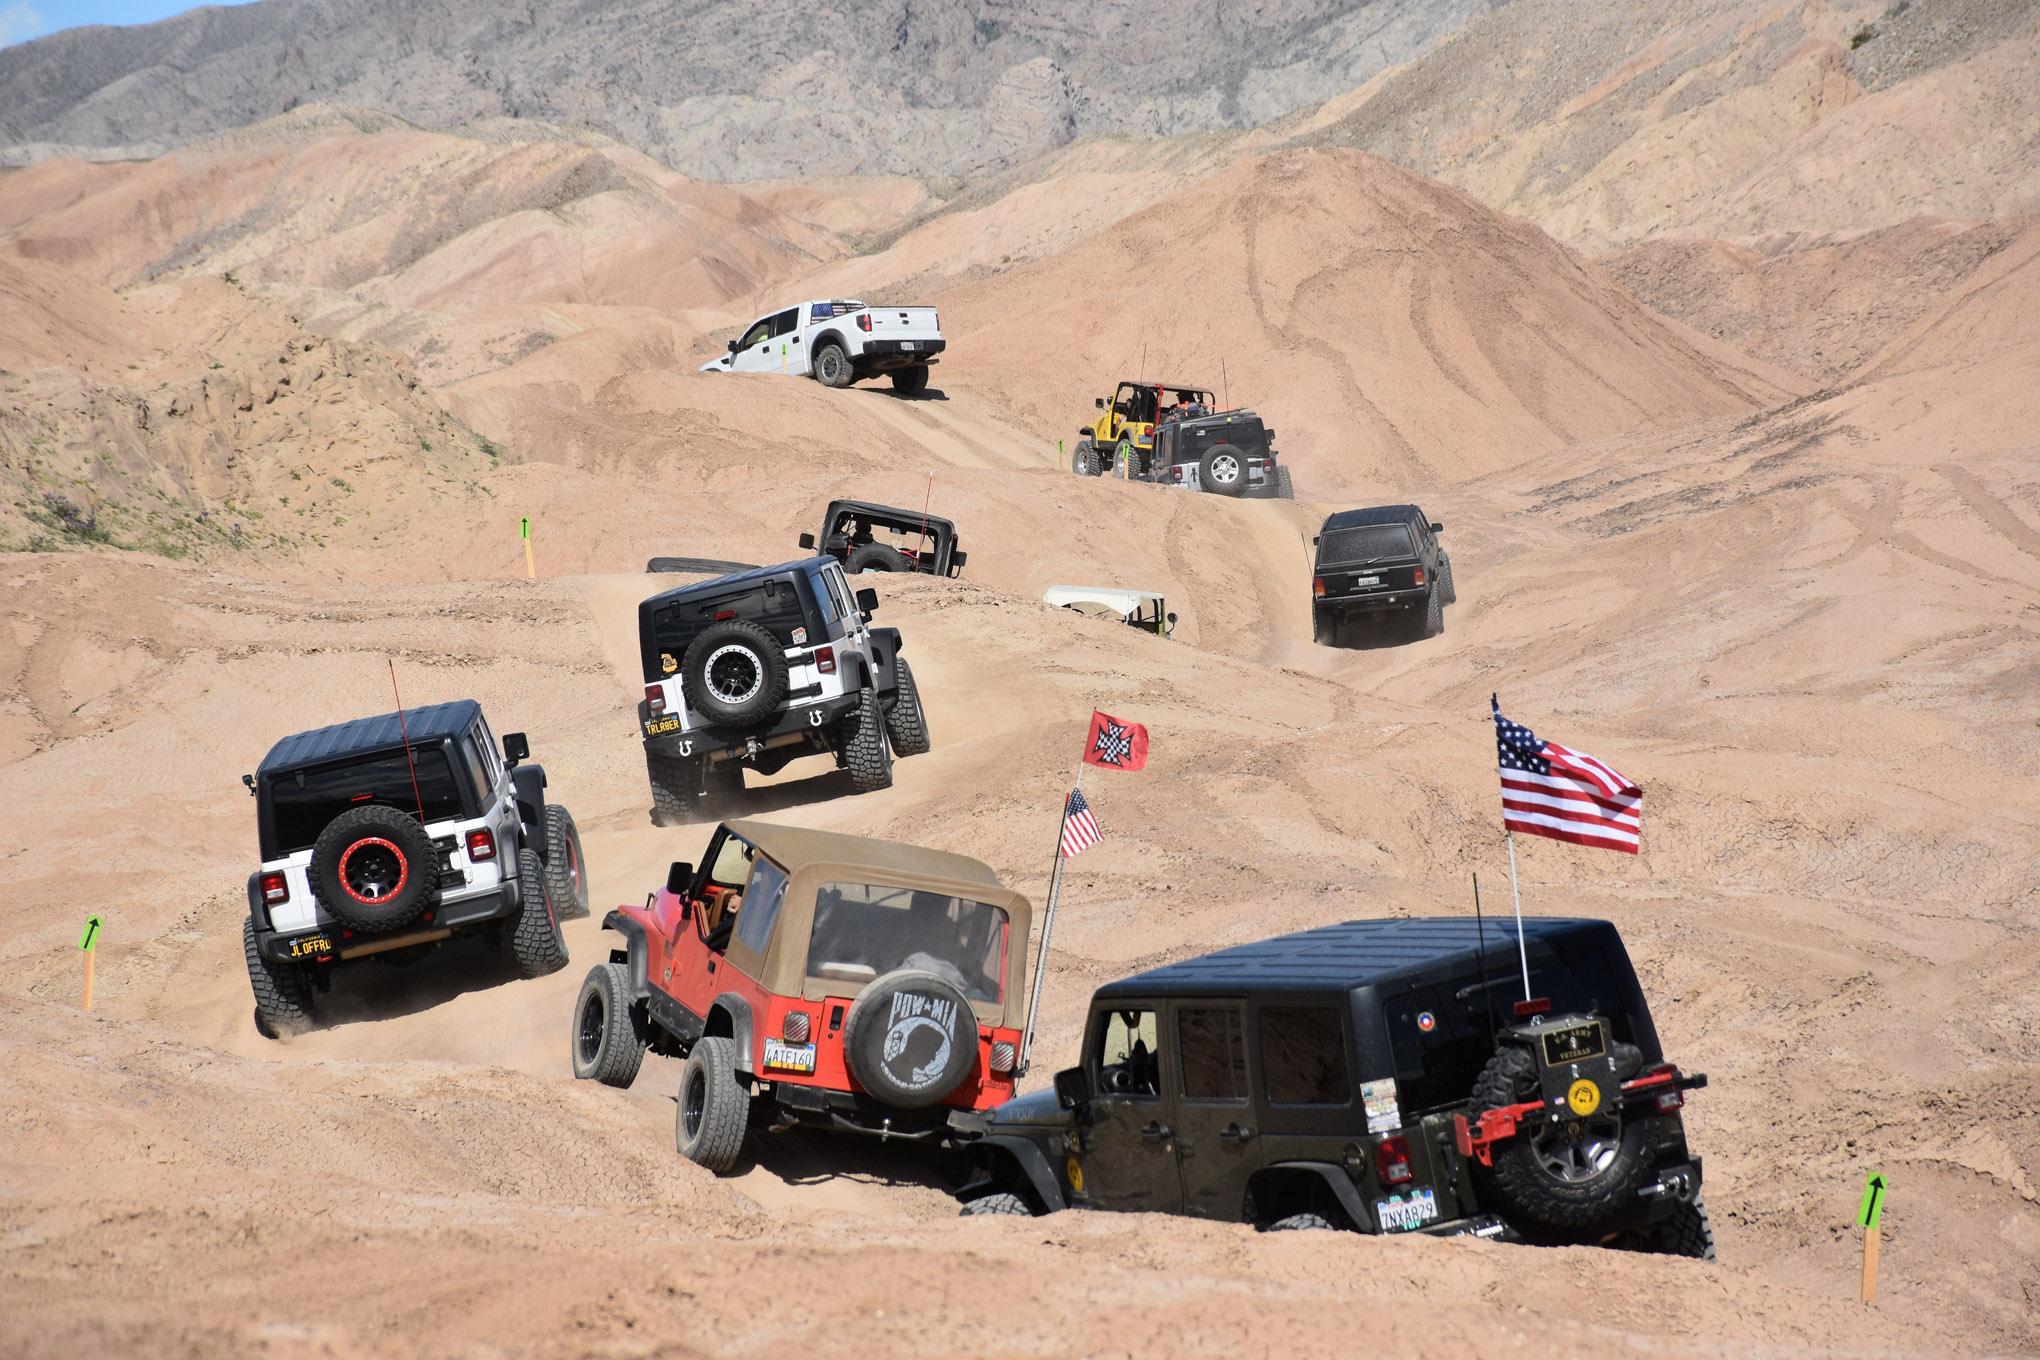 57th annual TDS desert safari lead